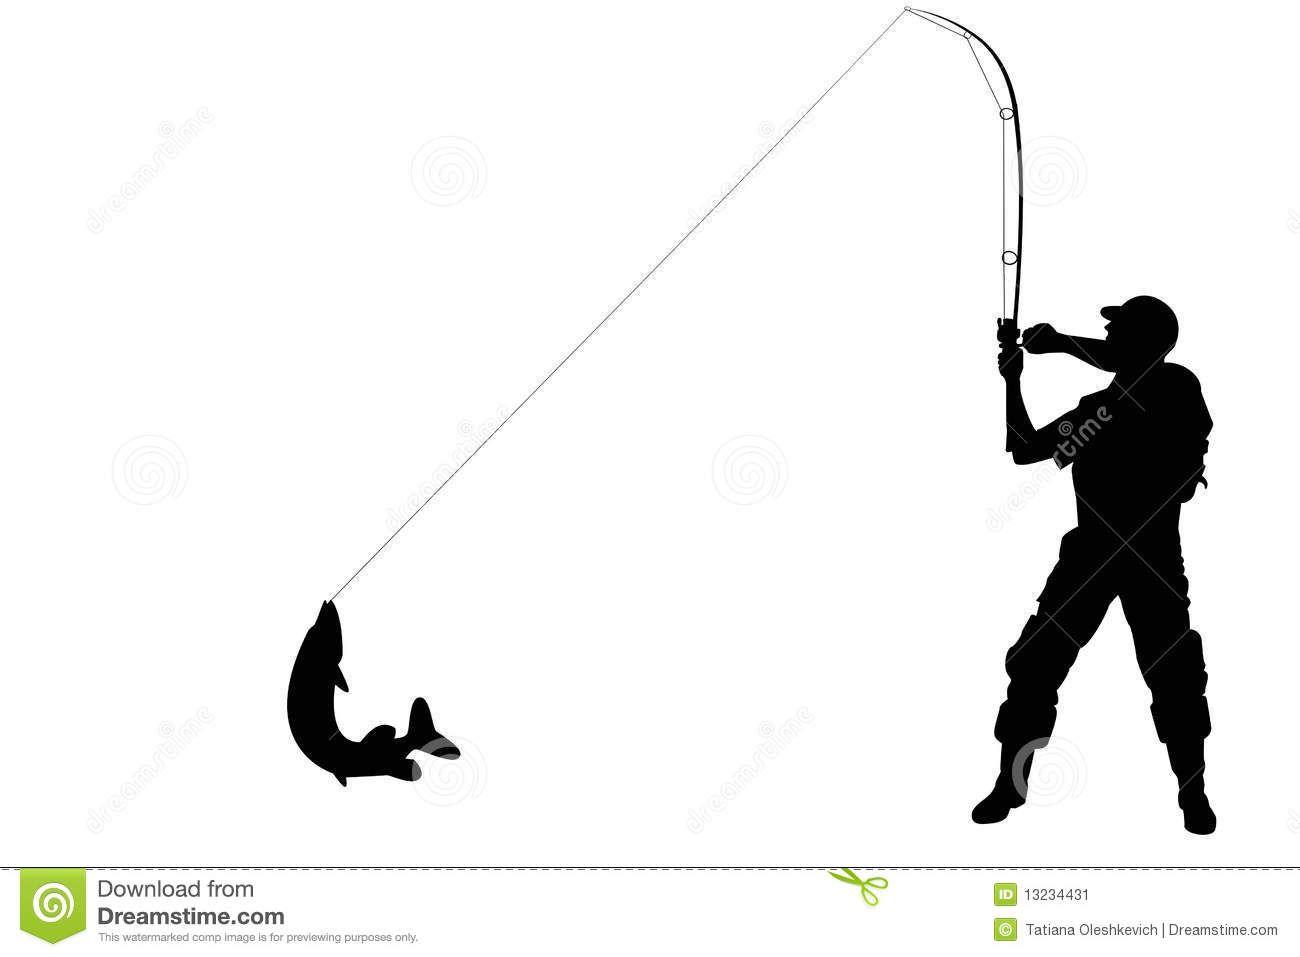 1300x957 Resultado De Imagen Para Siluetas De Pescadores Peces